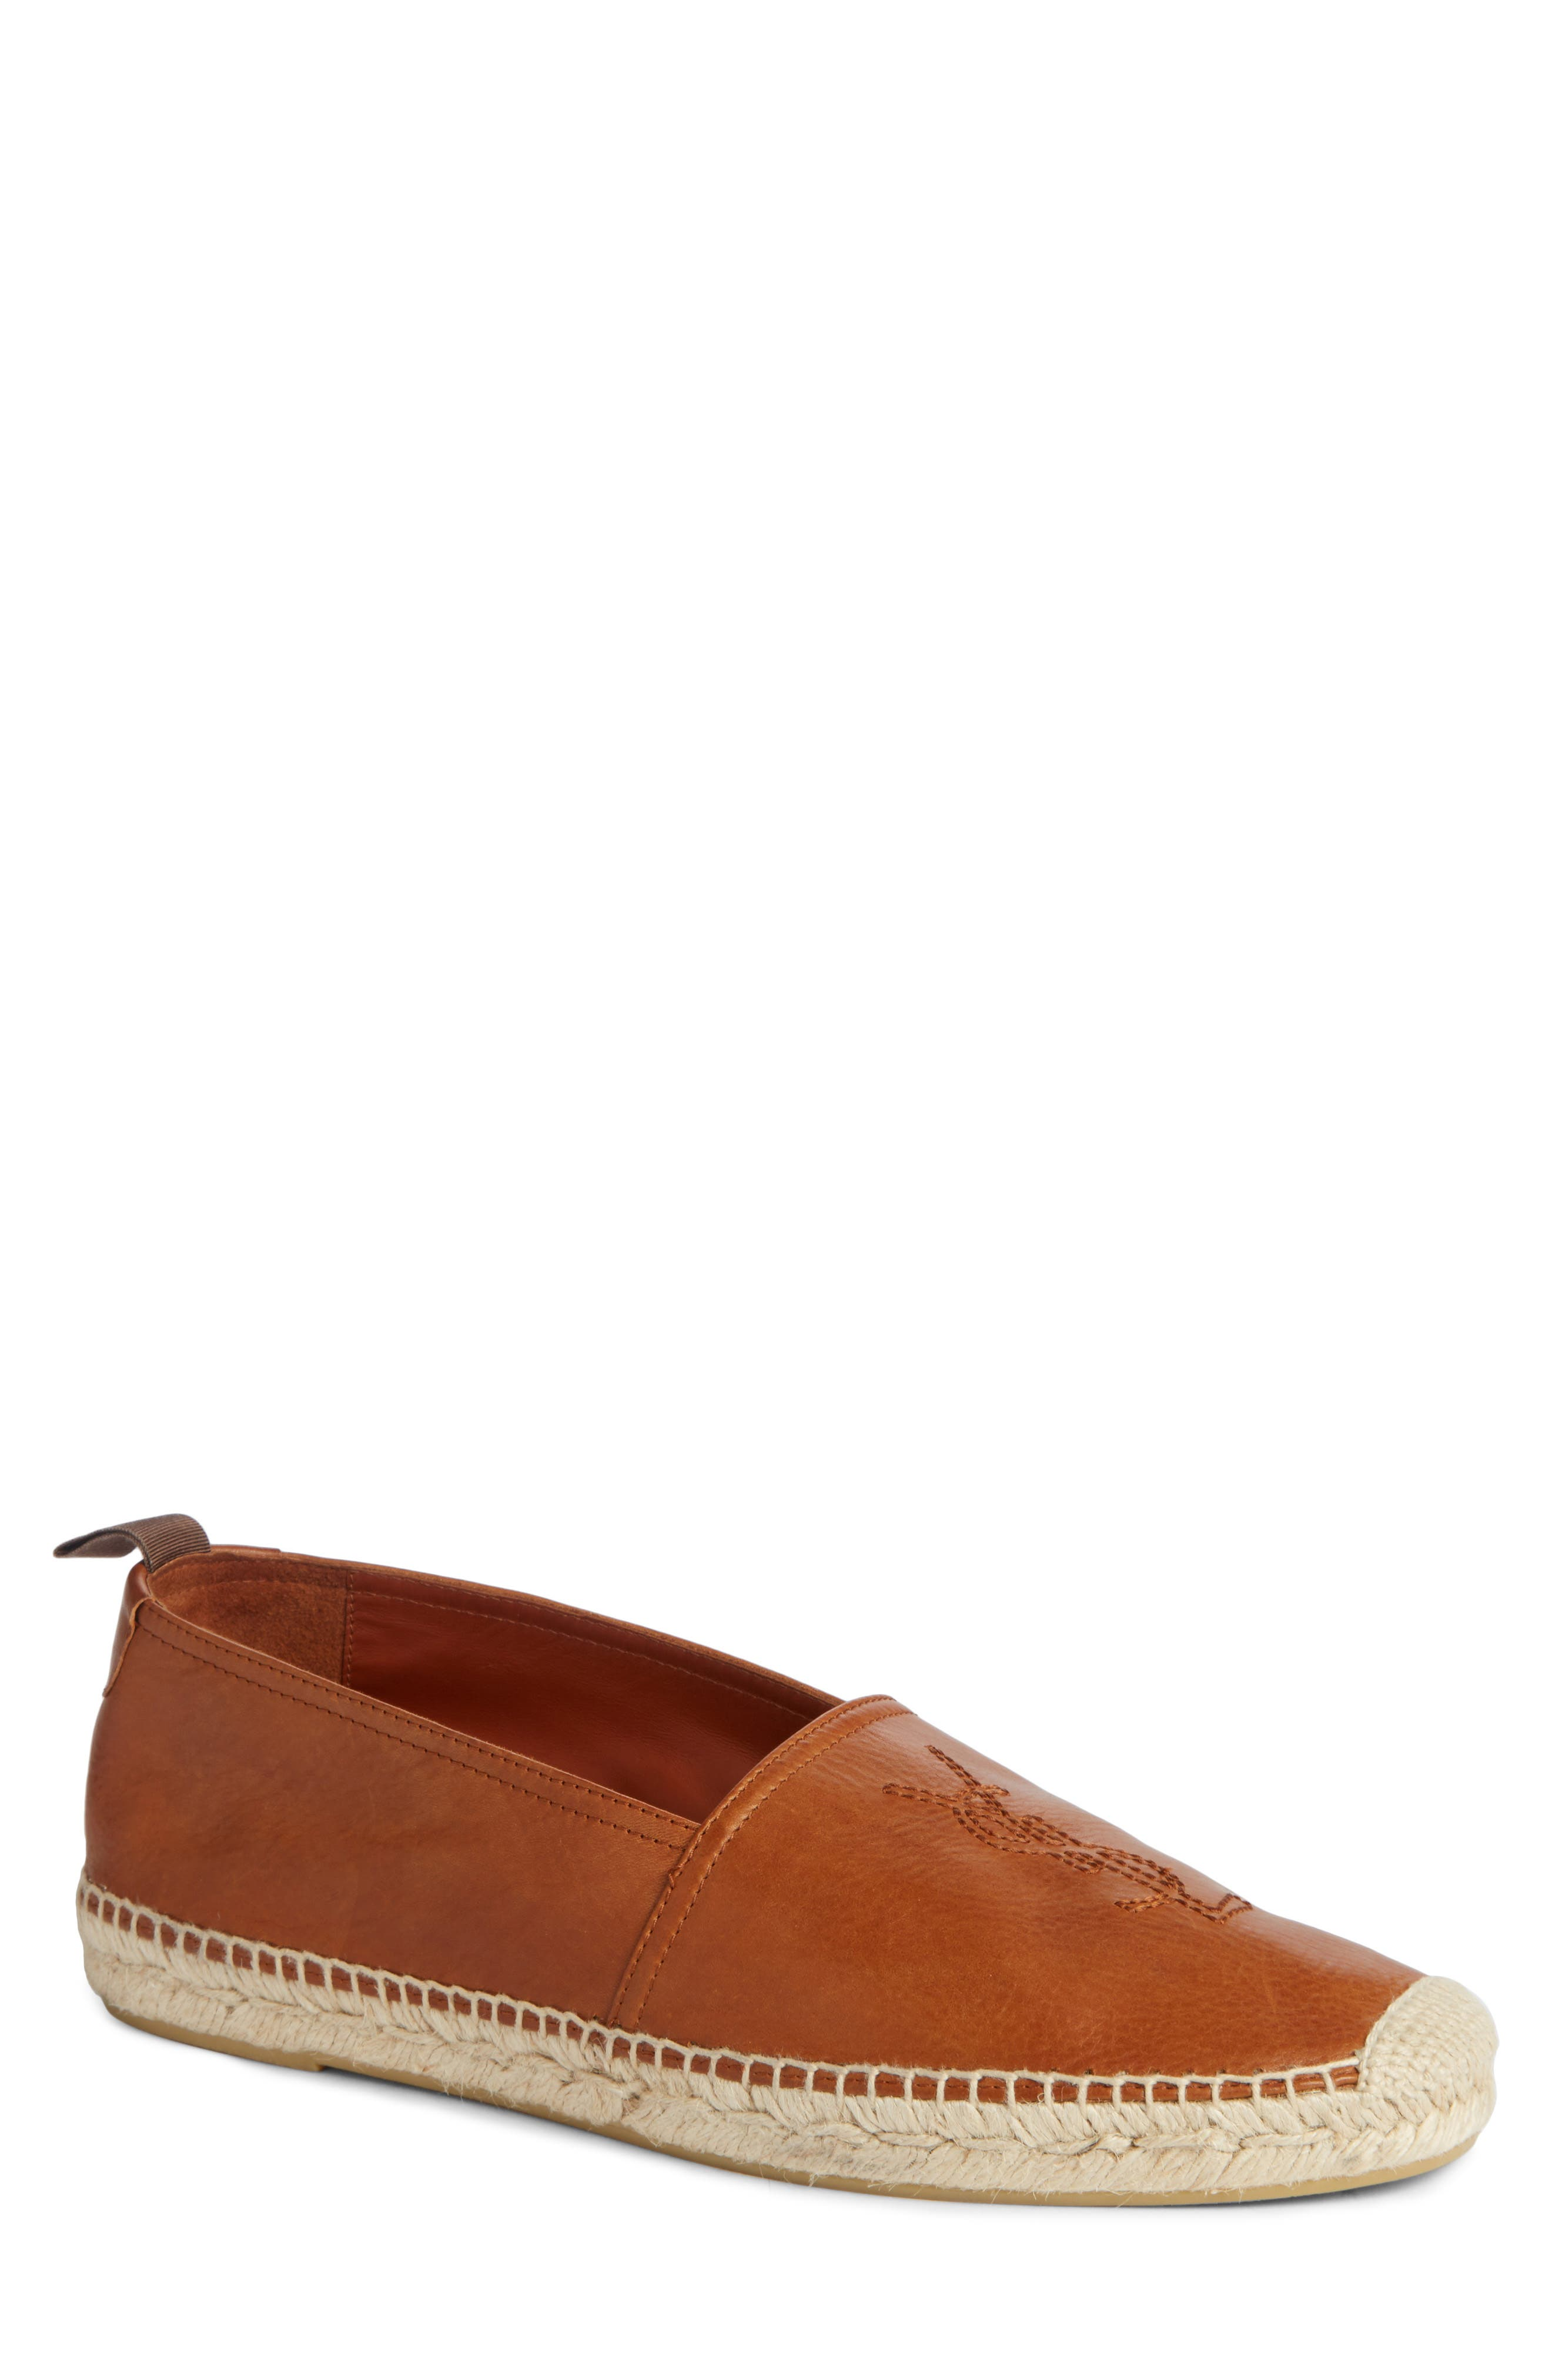 Espadrille,                         Main,                         color, Tan Leather